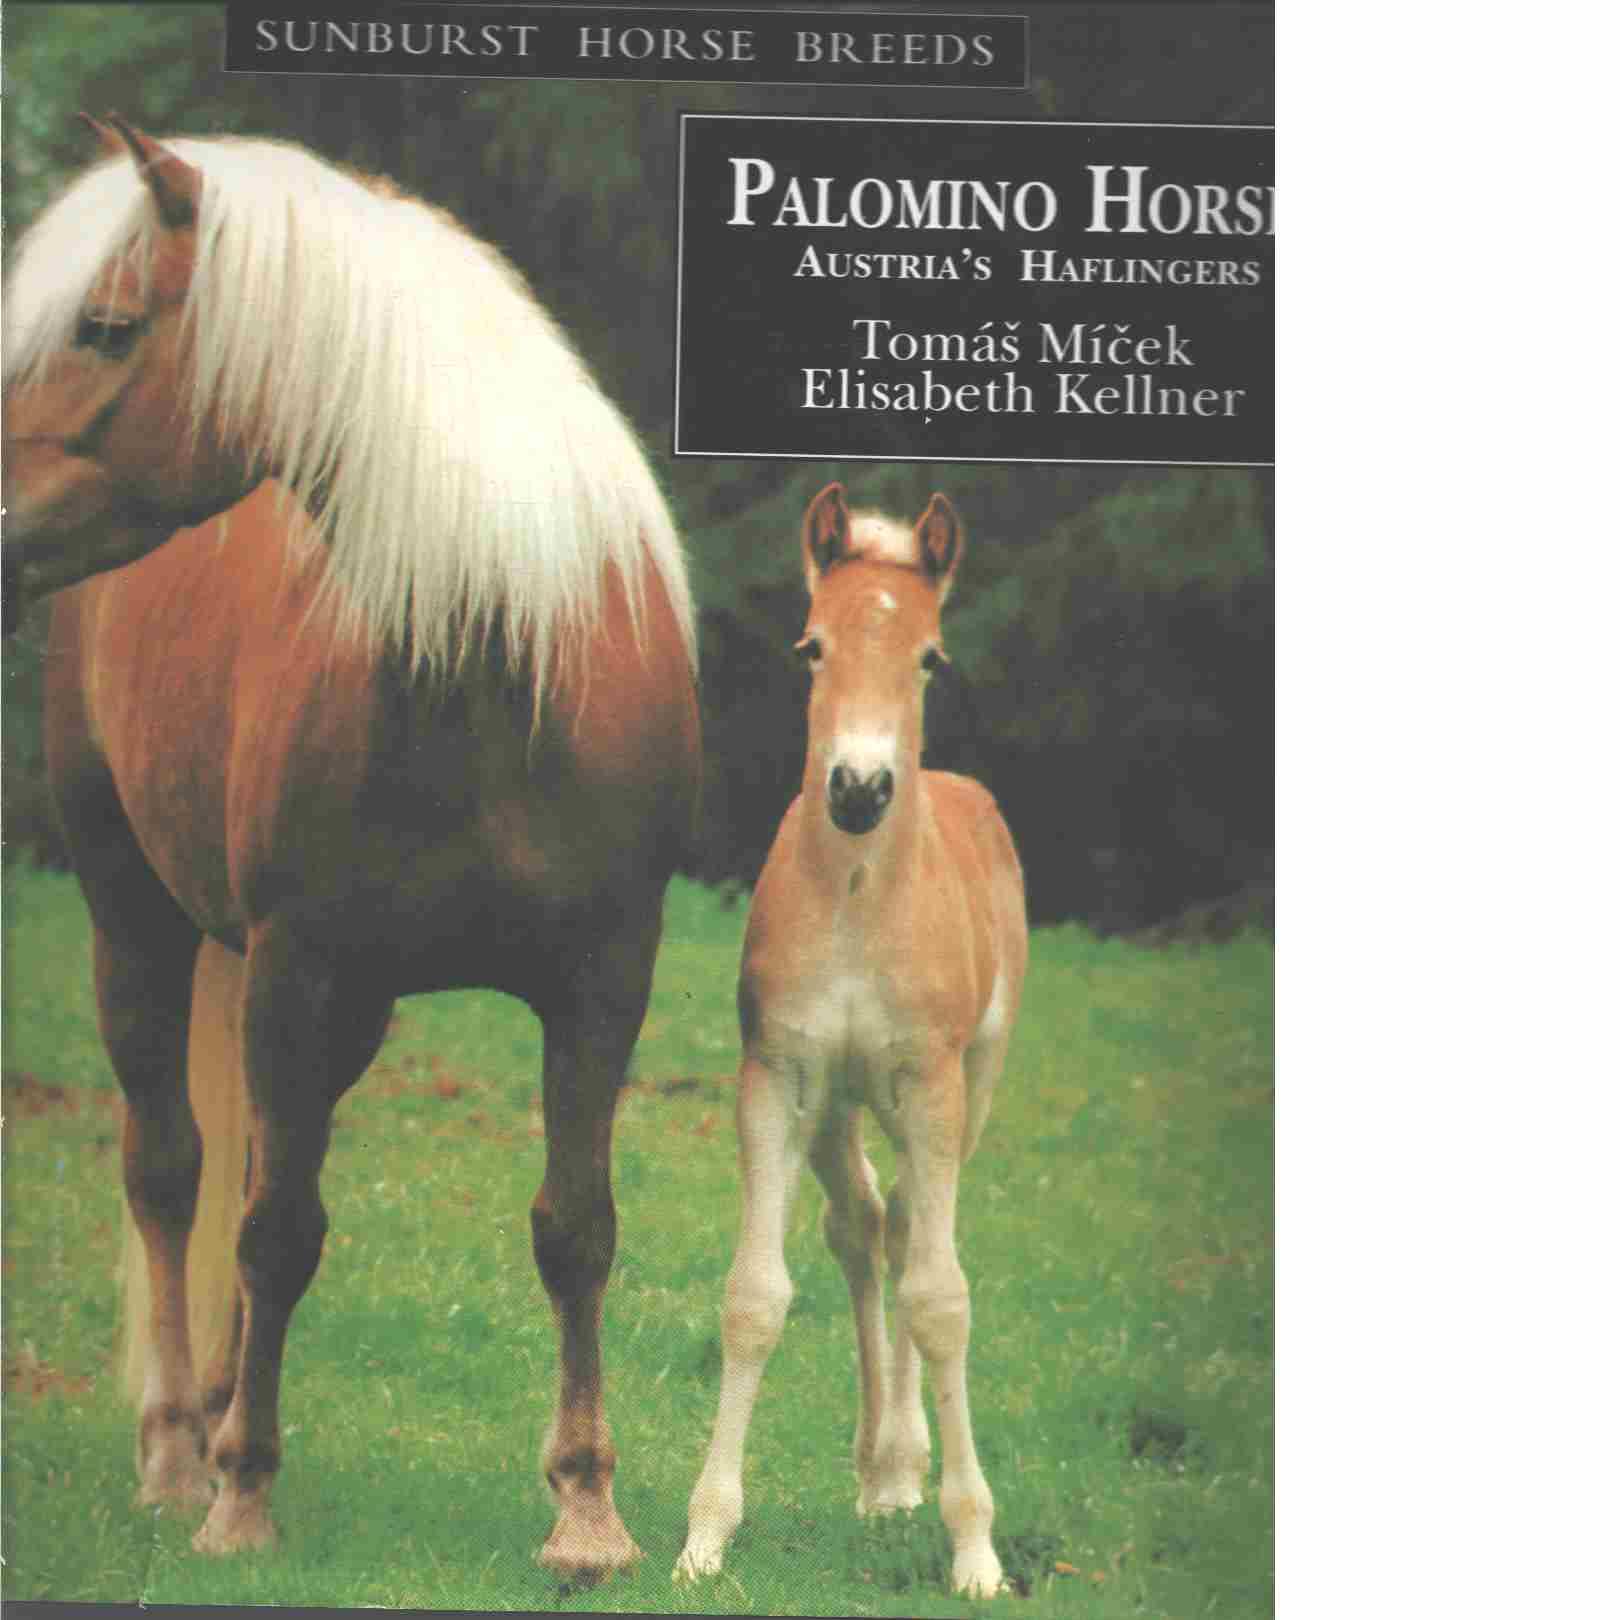 Palominos - Austria's Haflinger Horses  - Micek, Tomas and  Kellner, Elisabeth